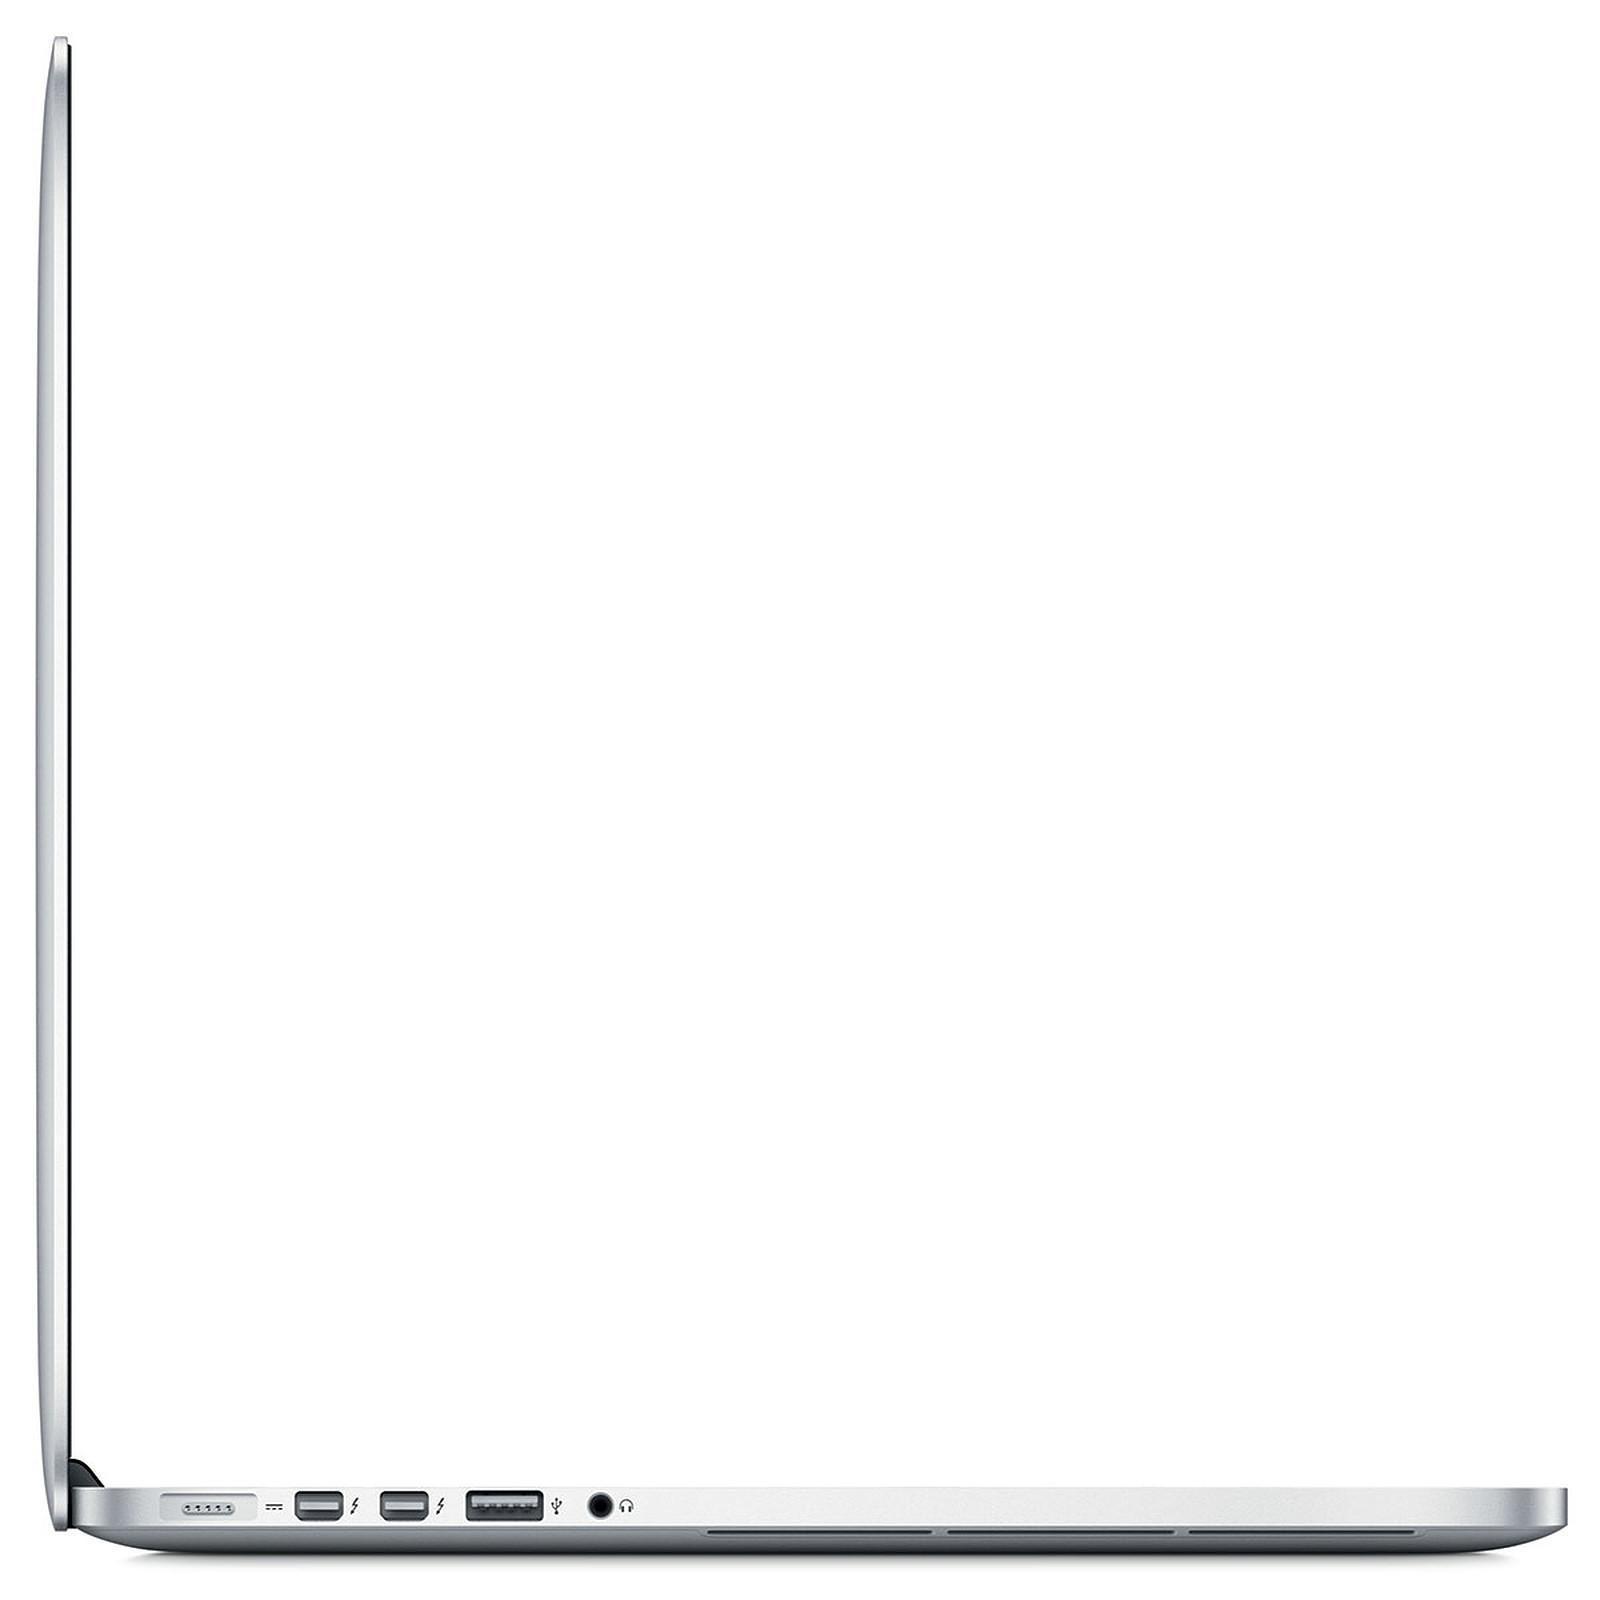 MacBook Pro Retina 15.4-inch (2015) - Core i7 - 16GB - HDD 256 GB QWERTY